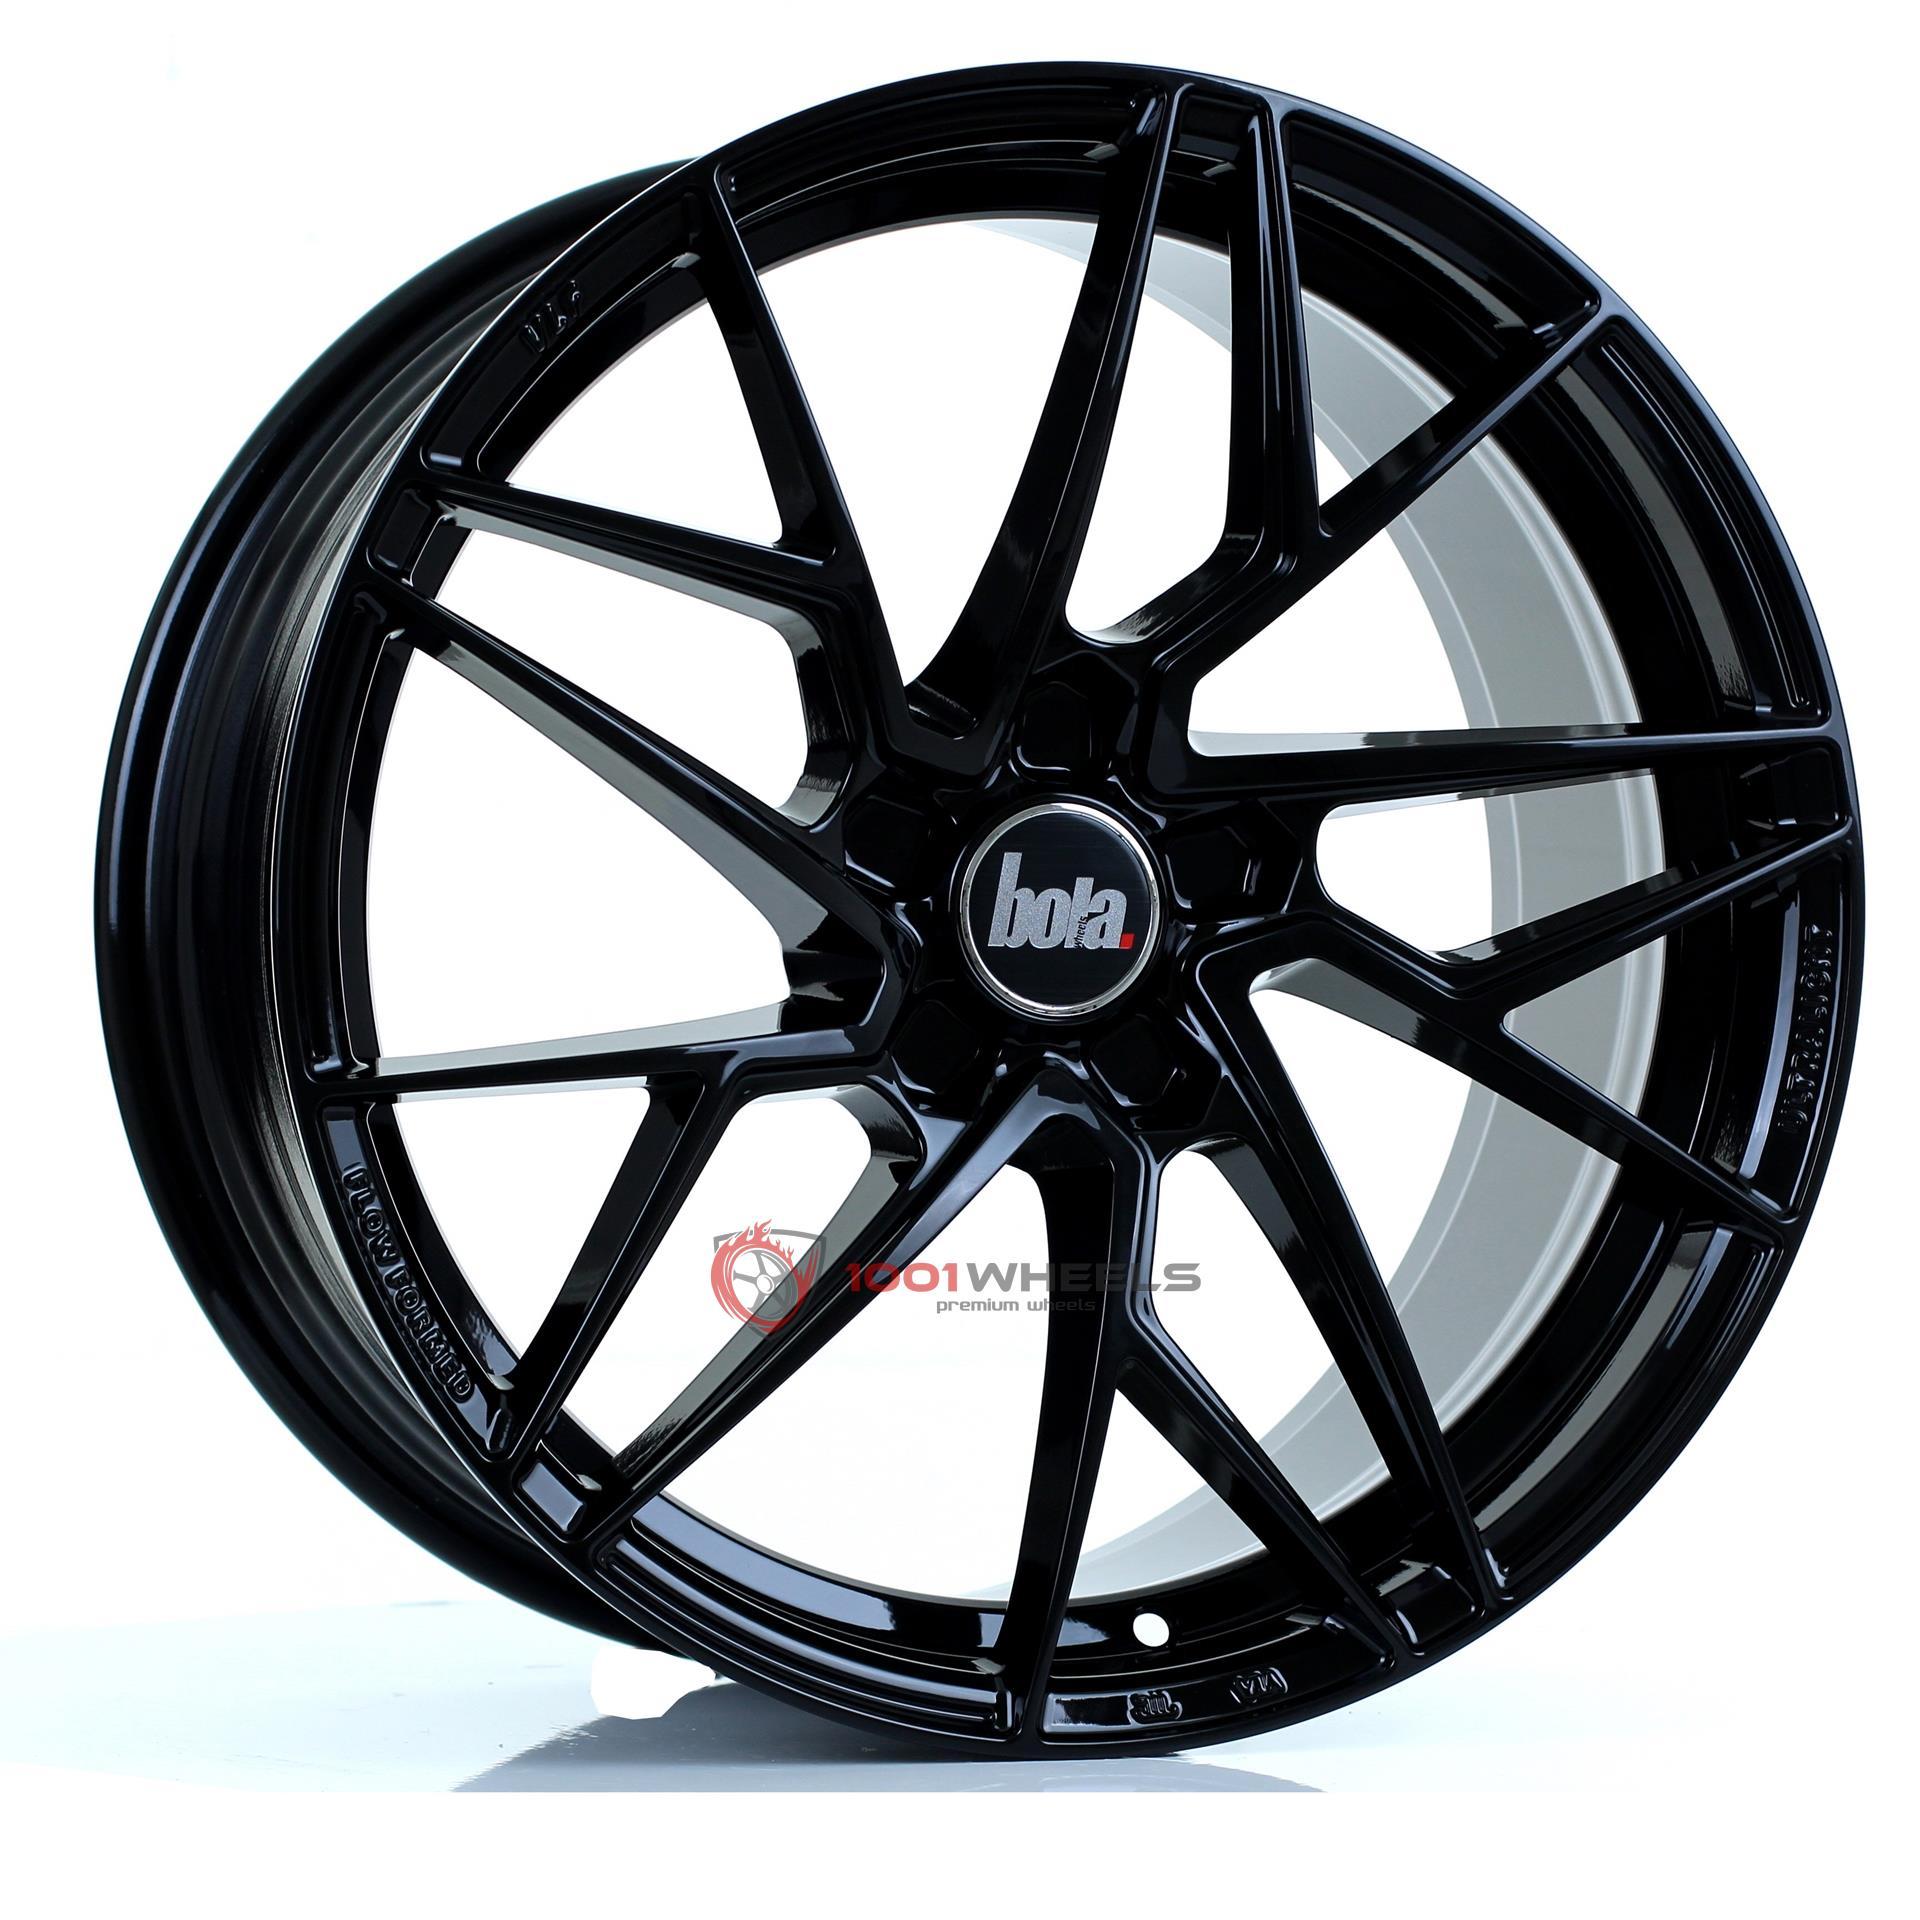 BOLA FLR gloss-black